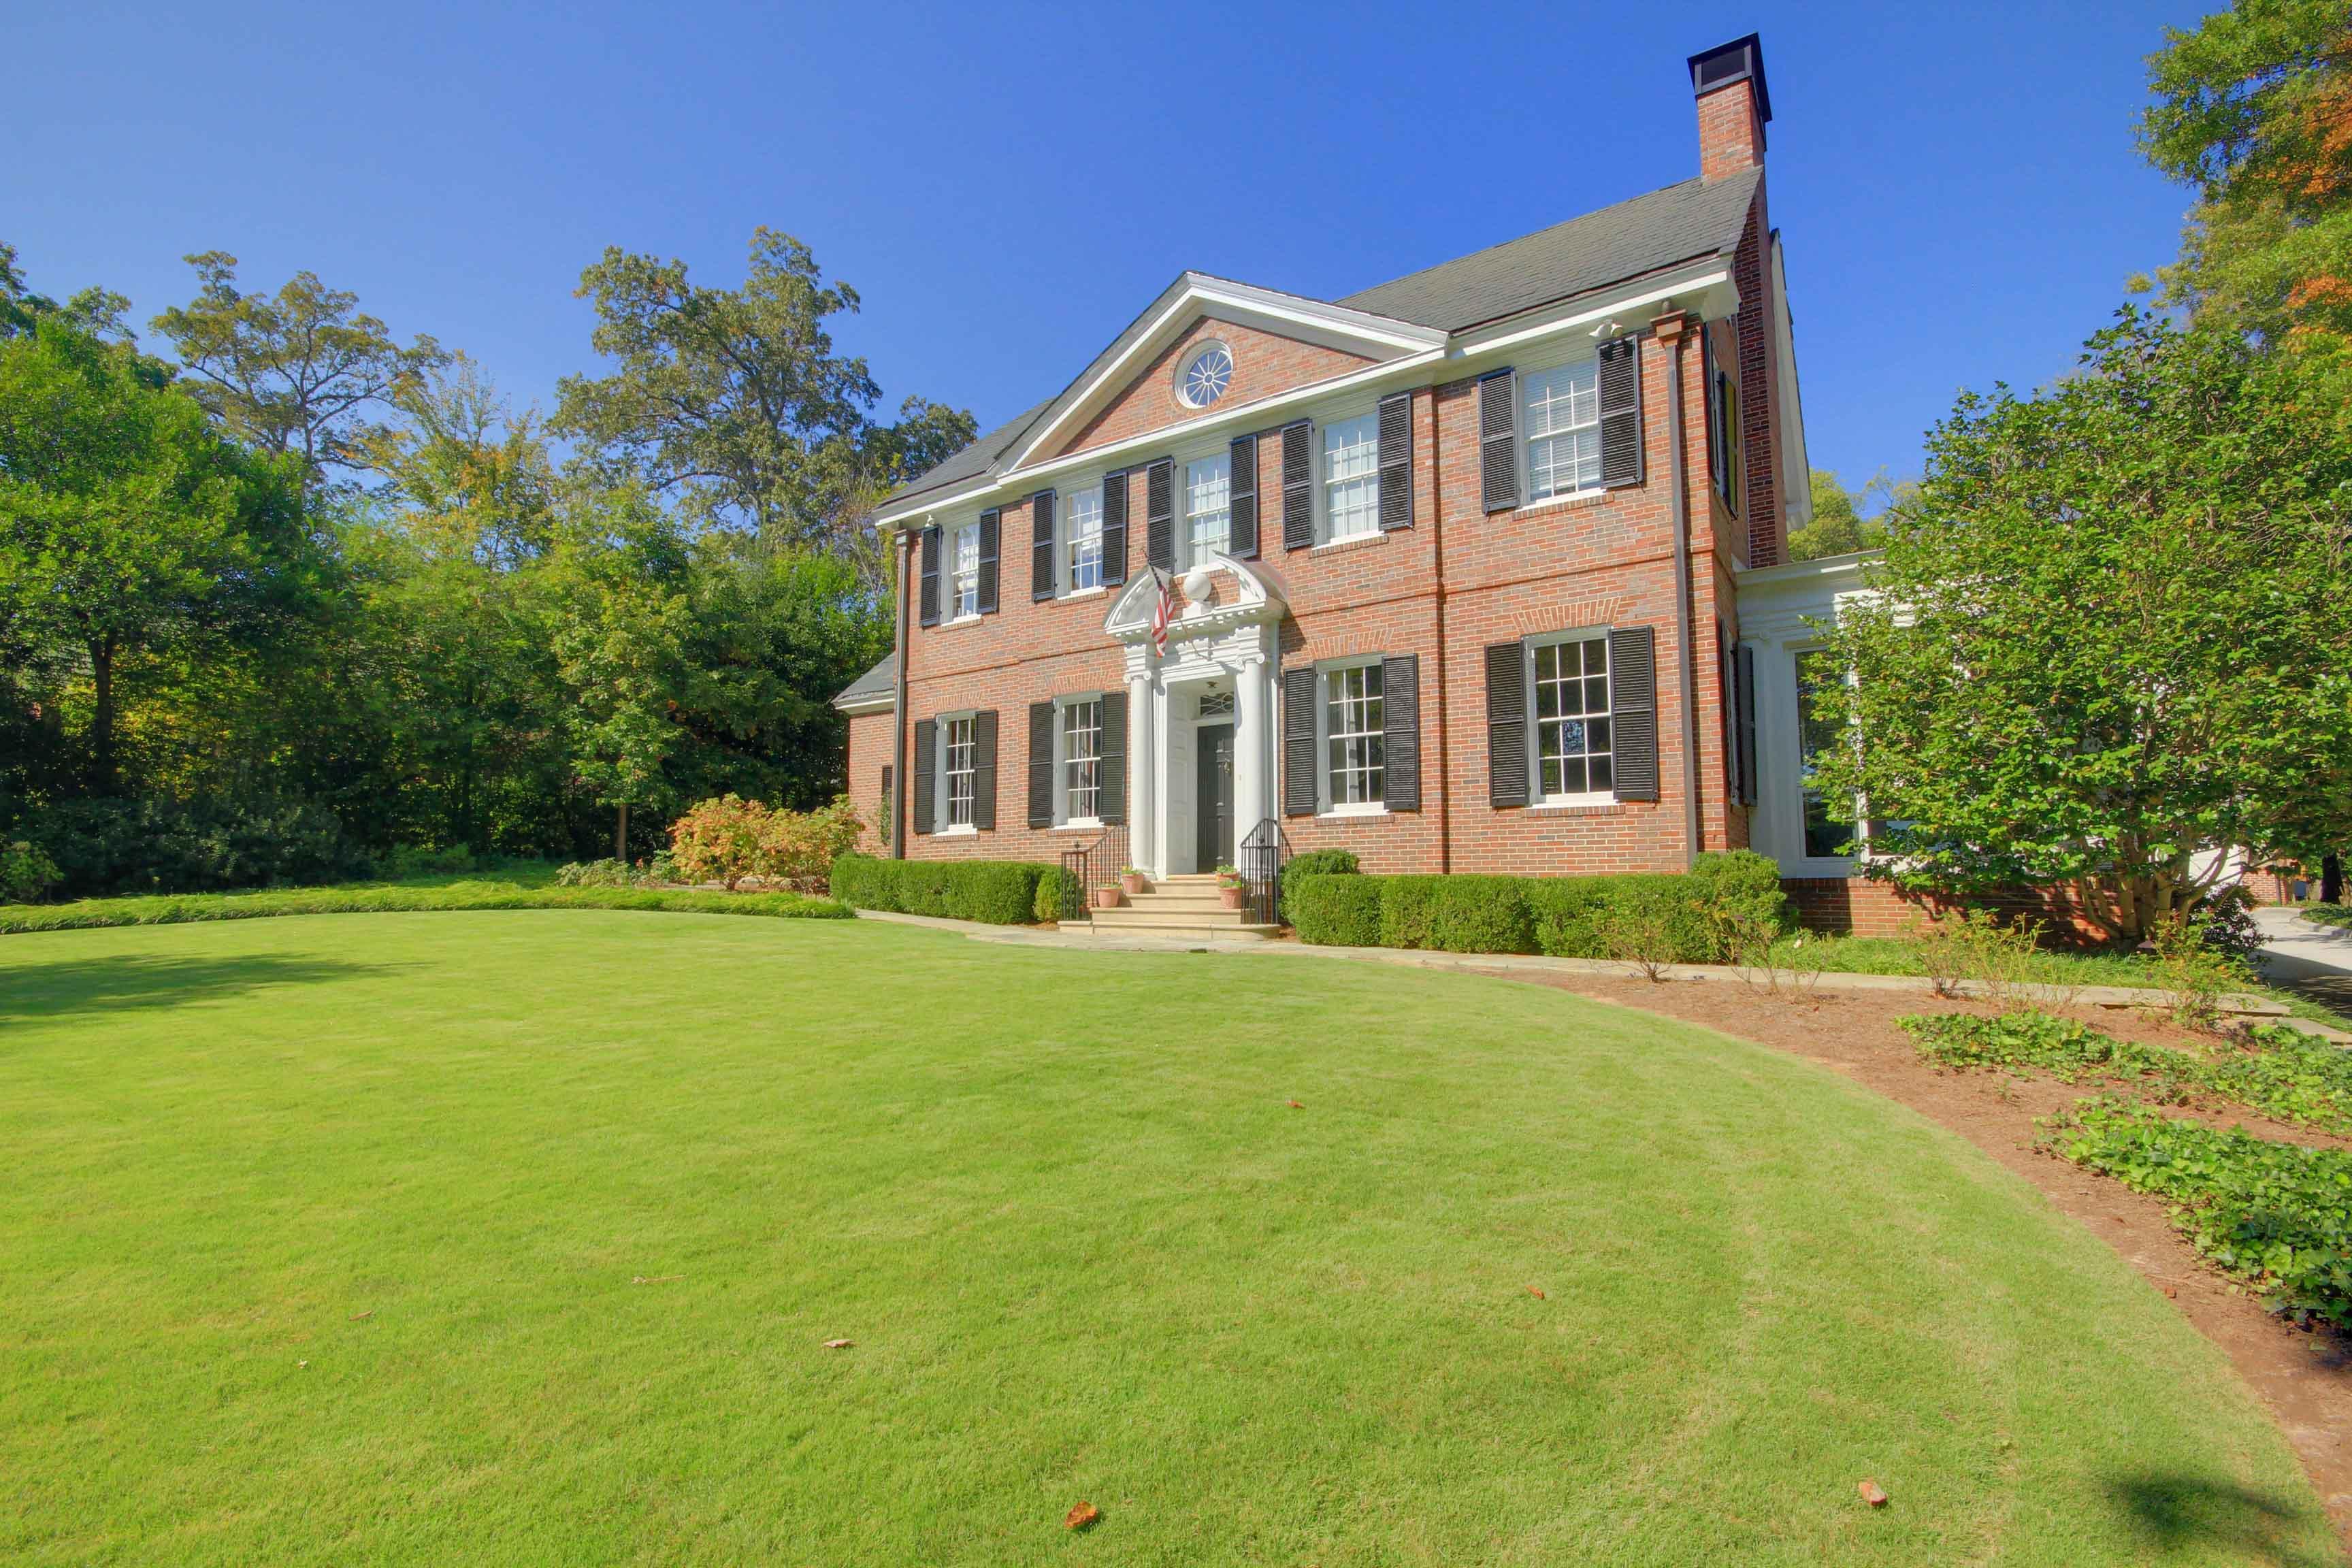 Announcing atlanta 39 s premiere spring event the 2015 druid Atlanta home and garden